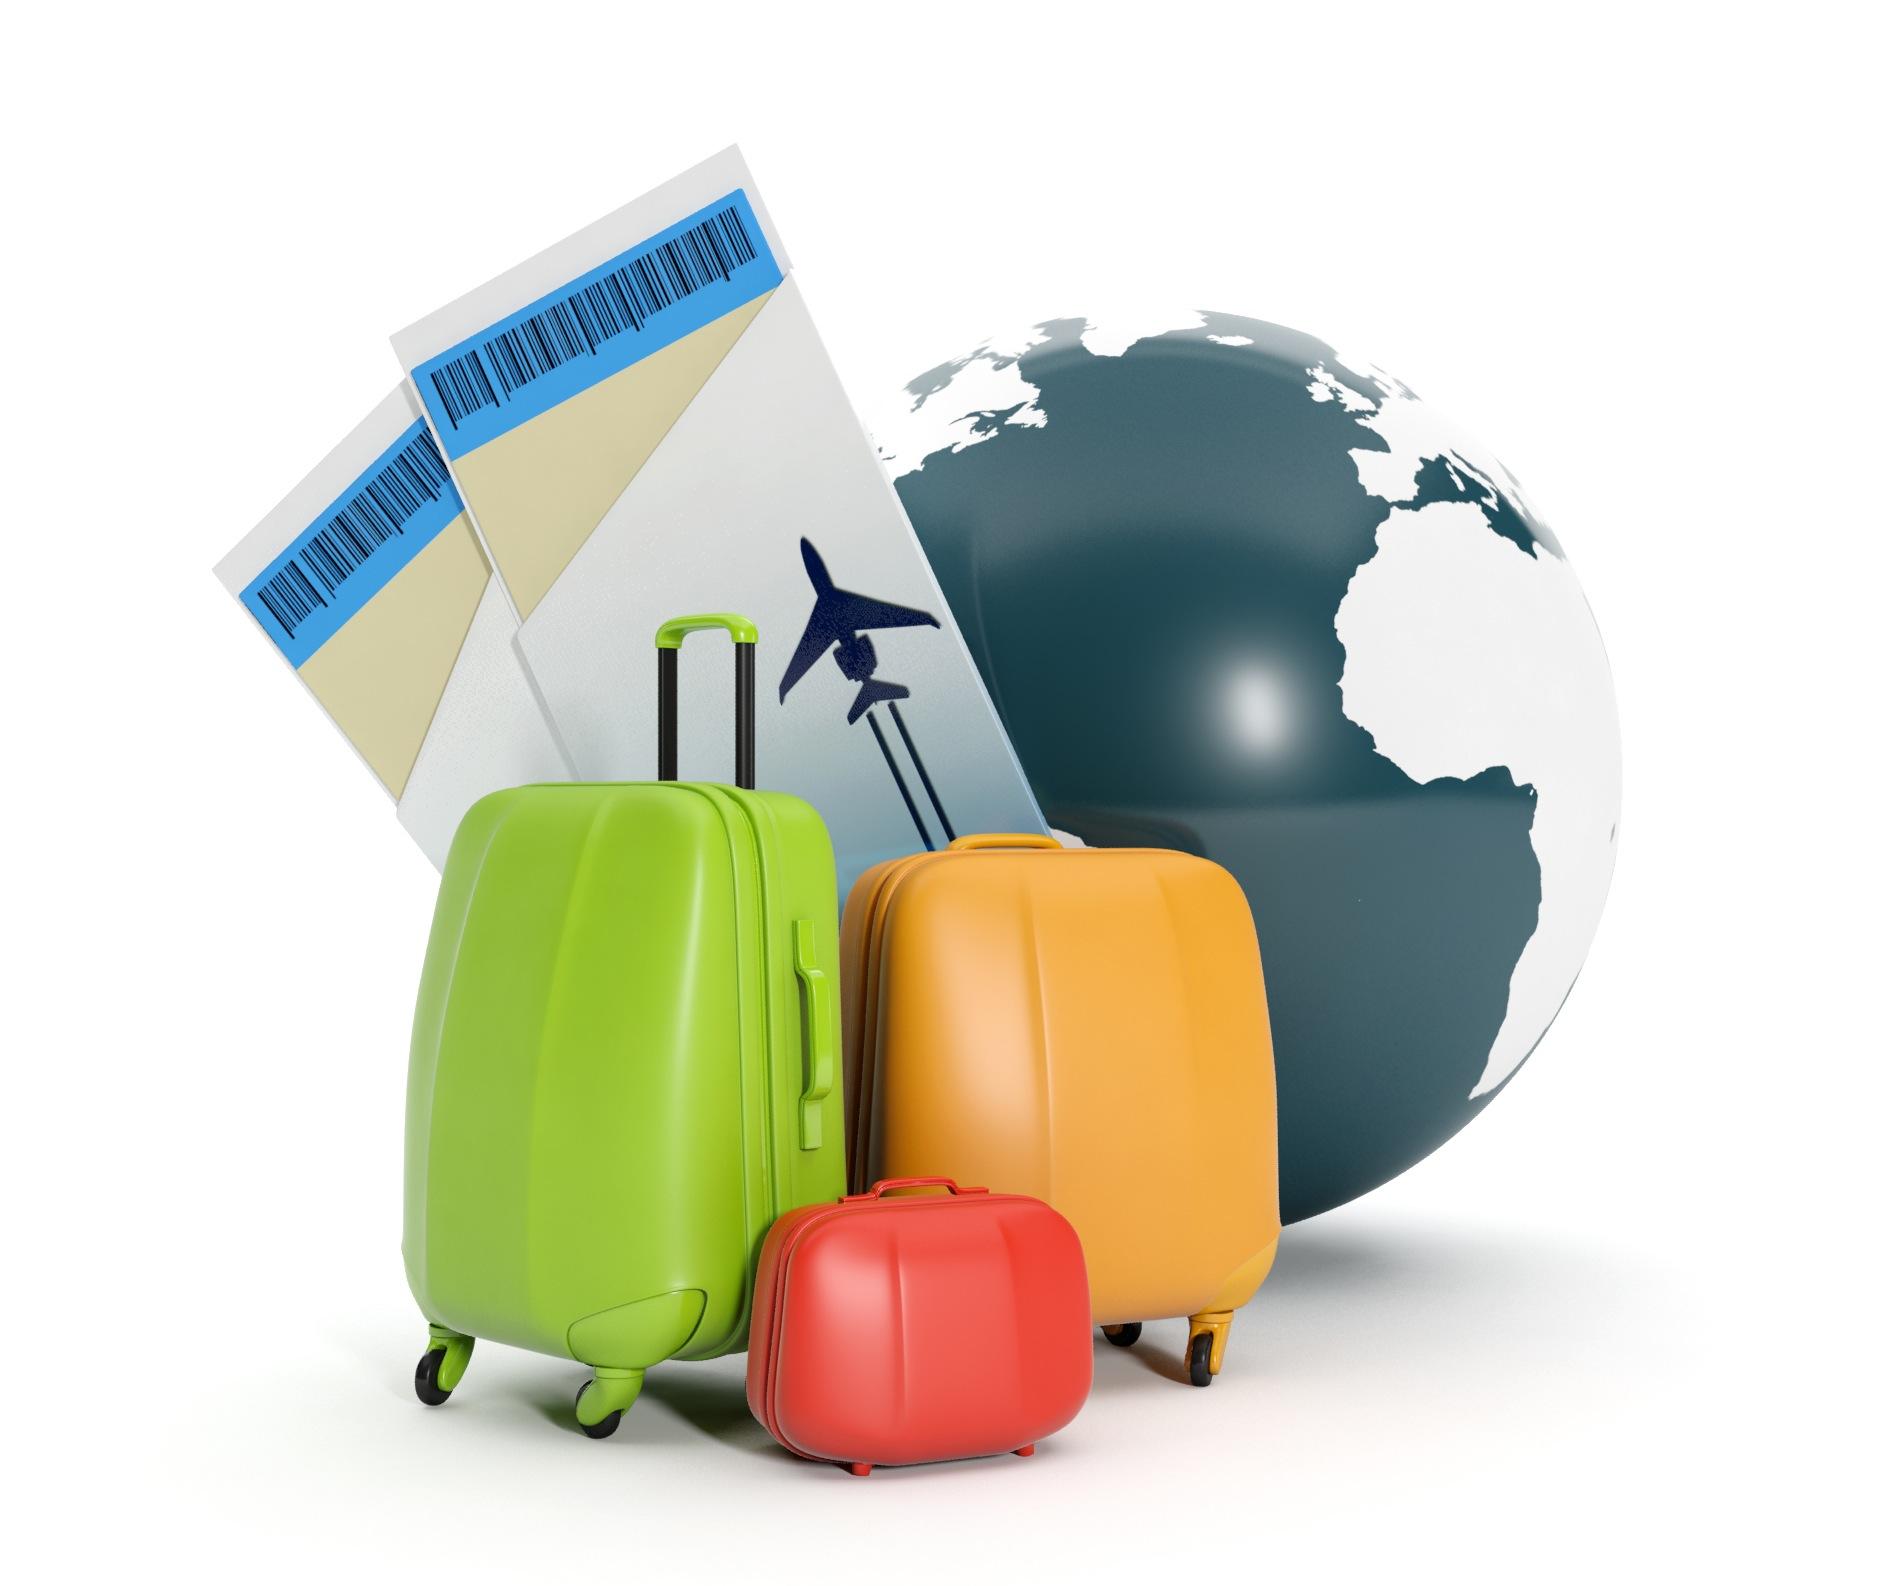 Страхование багажа туристов